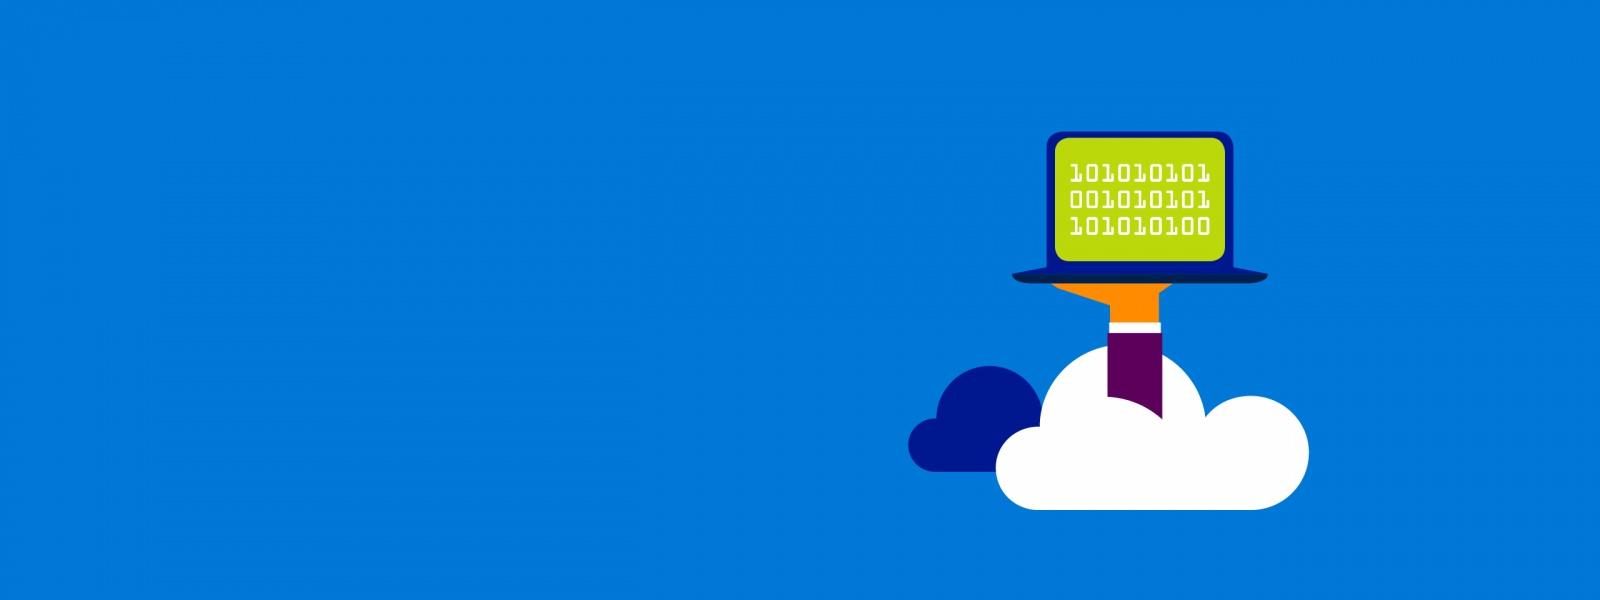 Развертываем Parallels RAS в Microsoft Azure за полчаса - 1